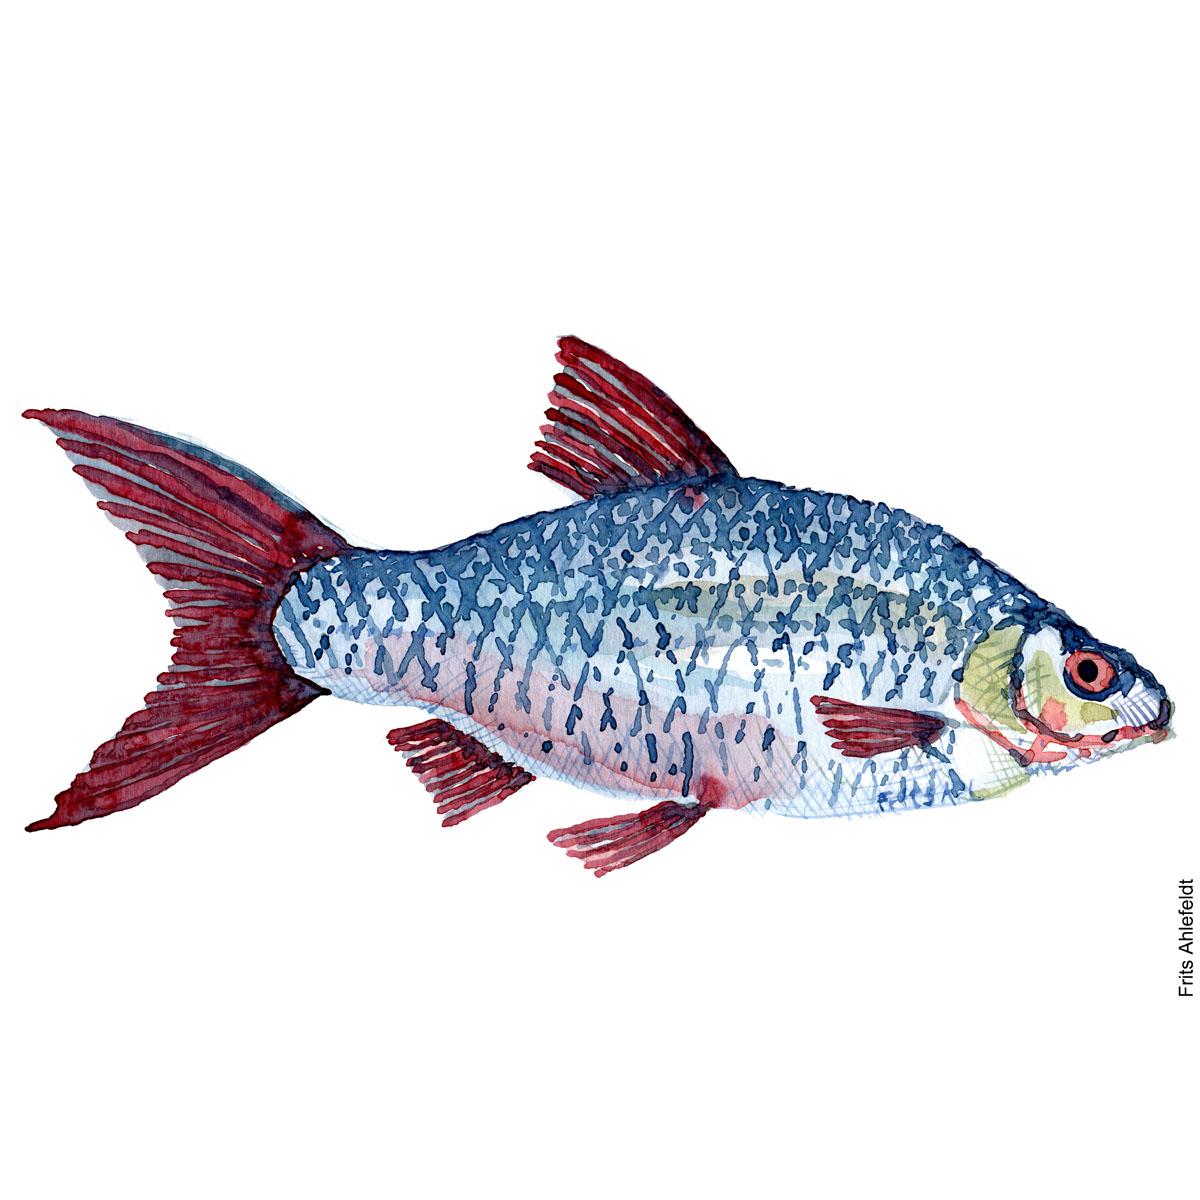 Roach. Skalle. Watercolour, Freshwater fish illustration by Frits Ahlefeldt